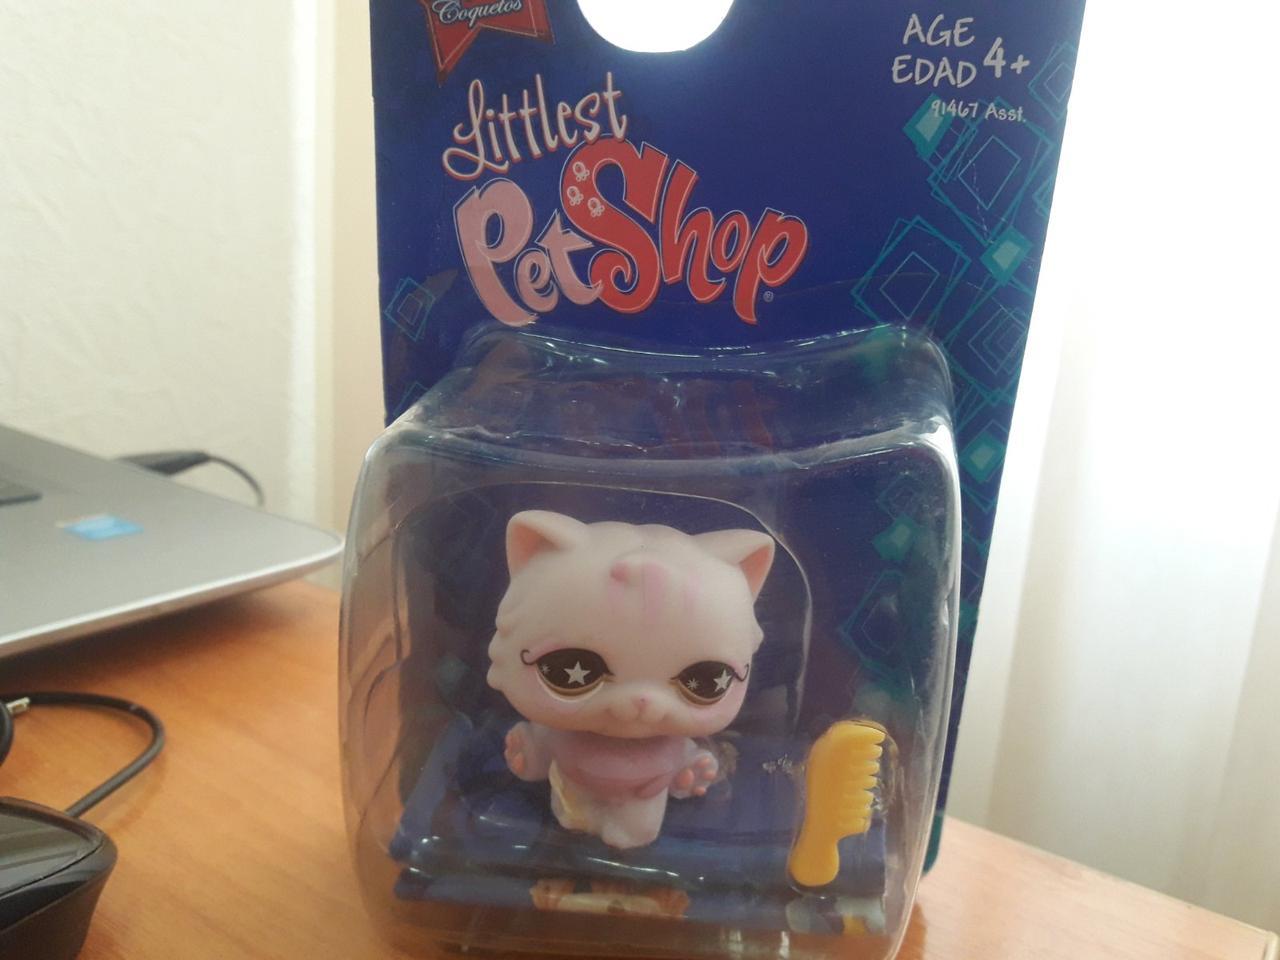 Littlest Pet Shop #891 игровой набор Sassiest Persian Kitty - lps старая коллекция-персидский котёнок 2008 год